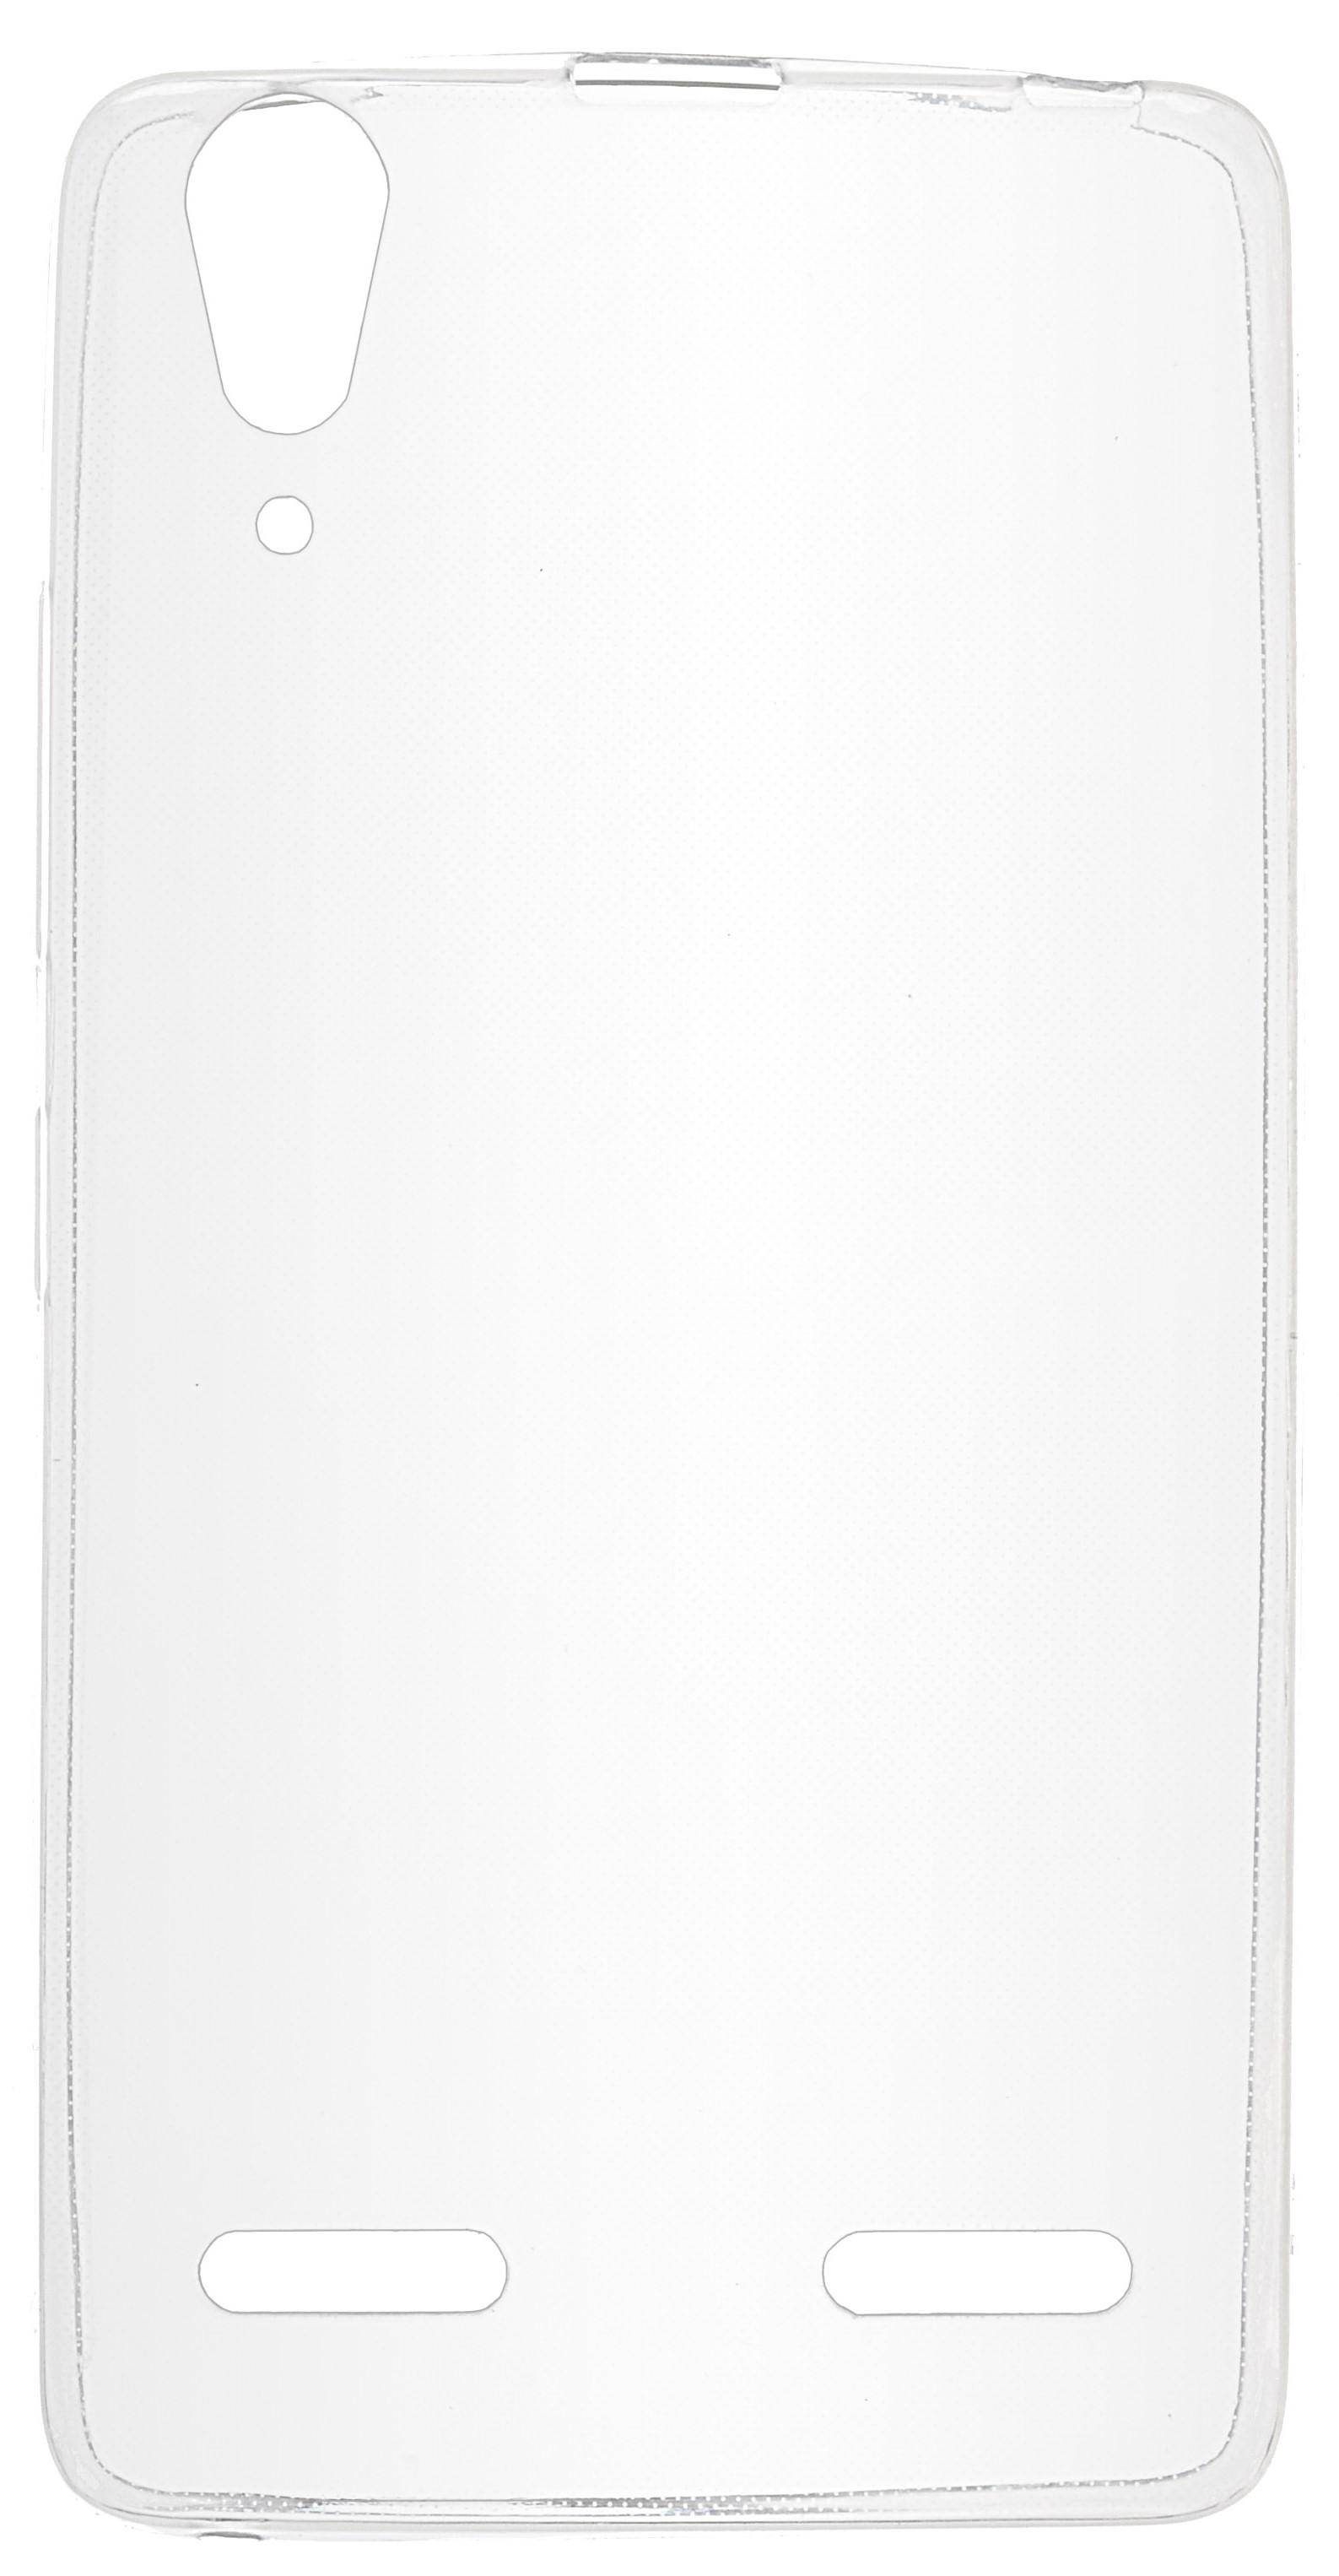 Чехол для сотового телефона skinBOX Slim Silicone, 4630042528505, прозрачный цена и фото